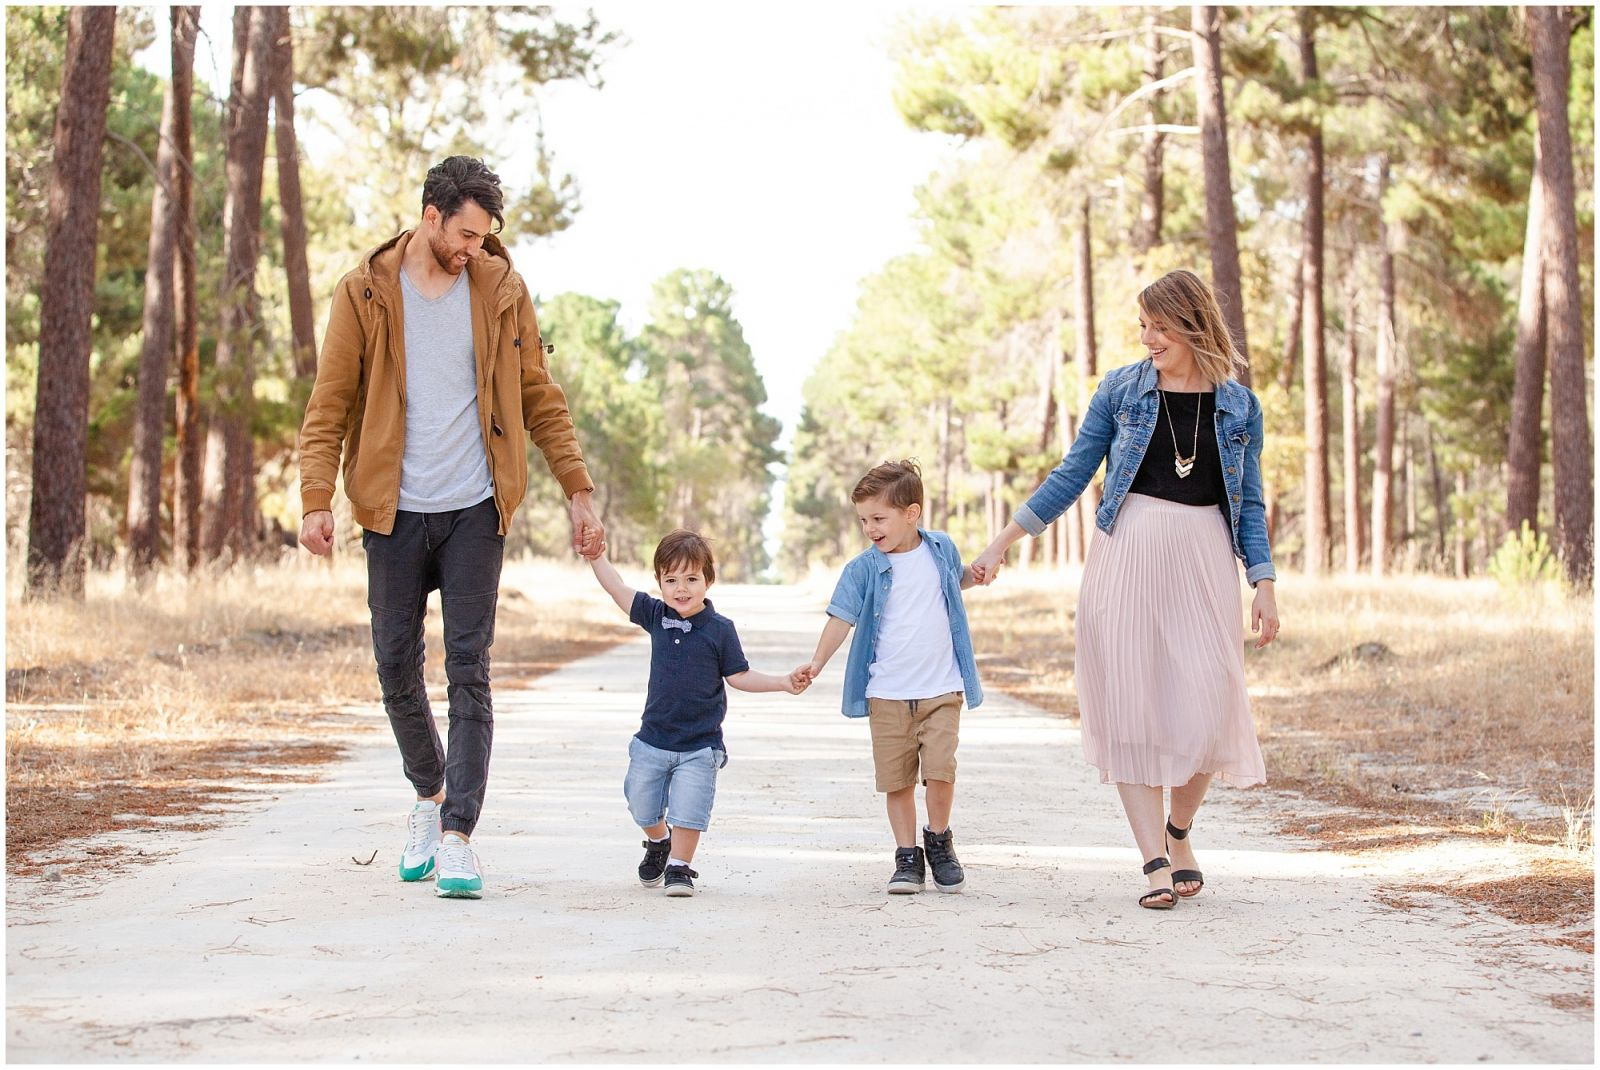 Perth family photographer family portrait session